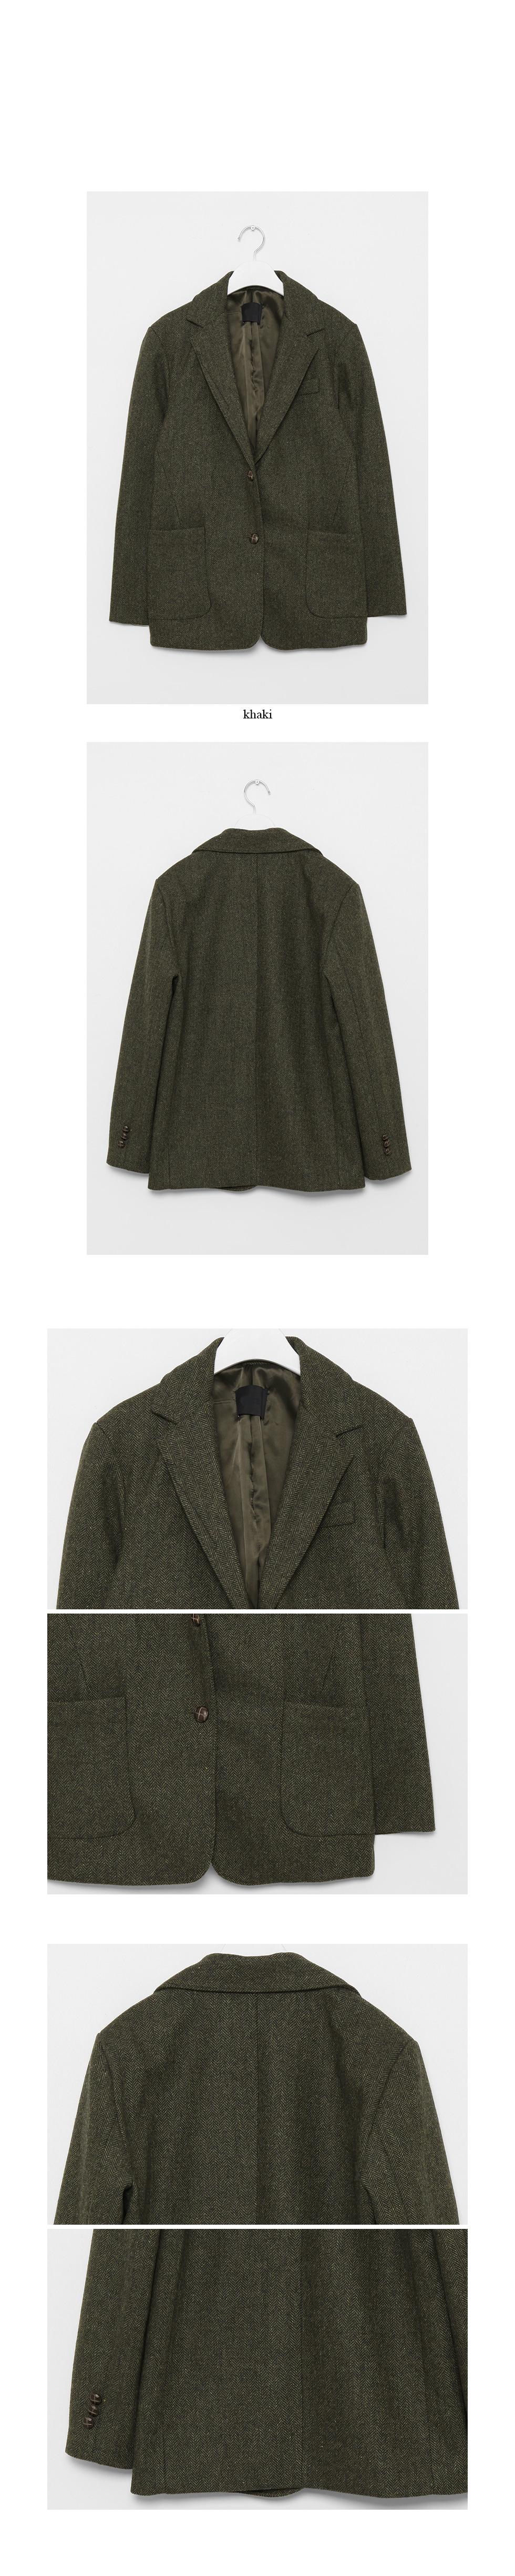 standard herringbone jacket